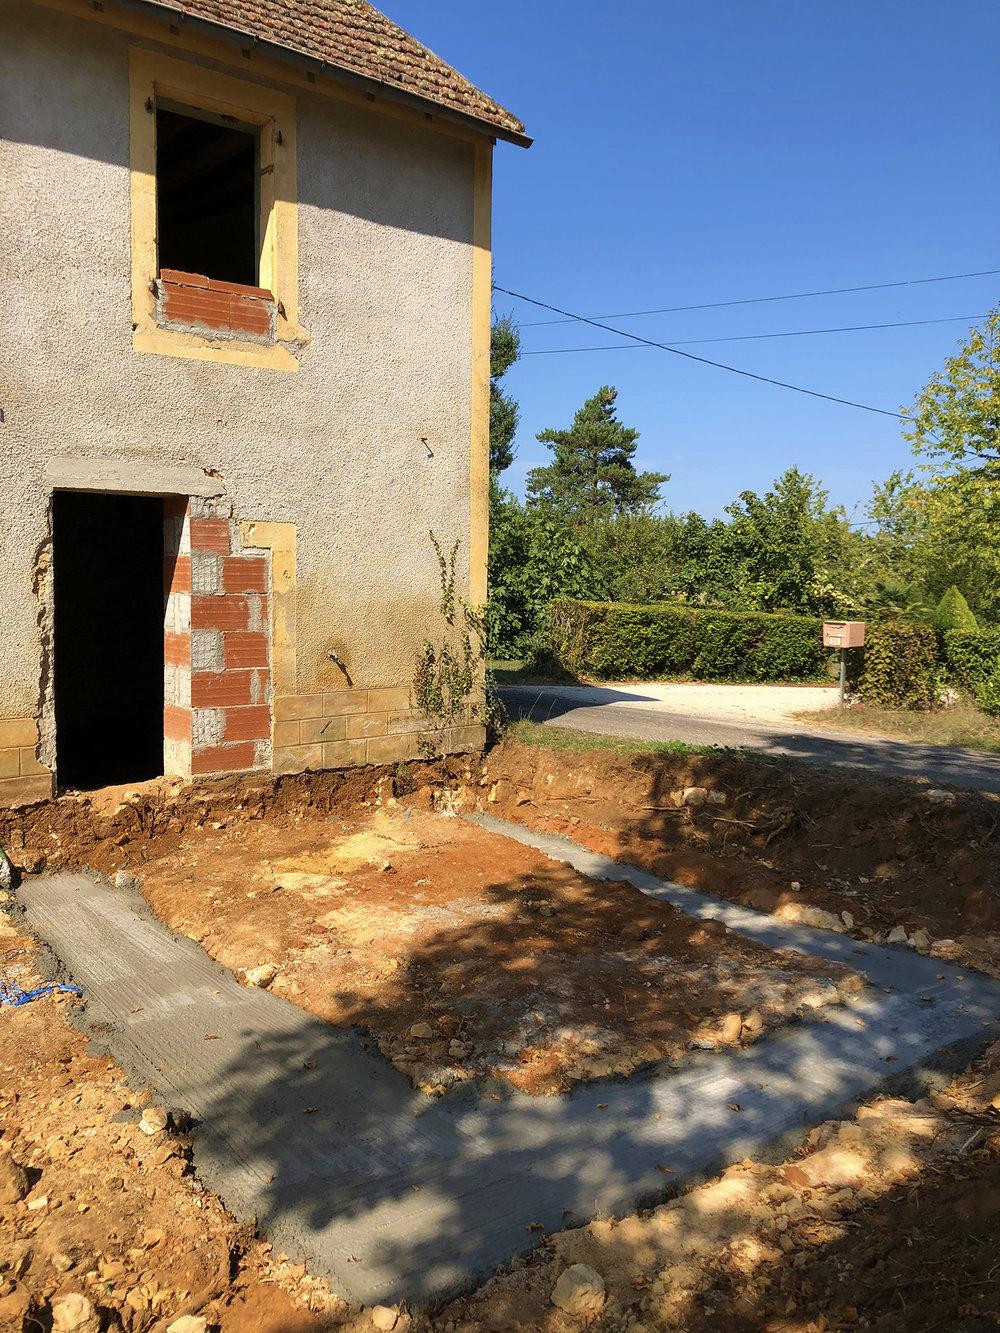 Kitchen foundations